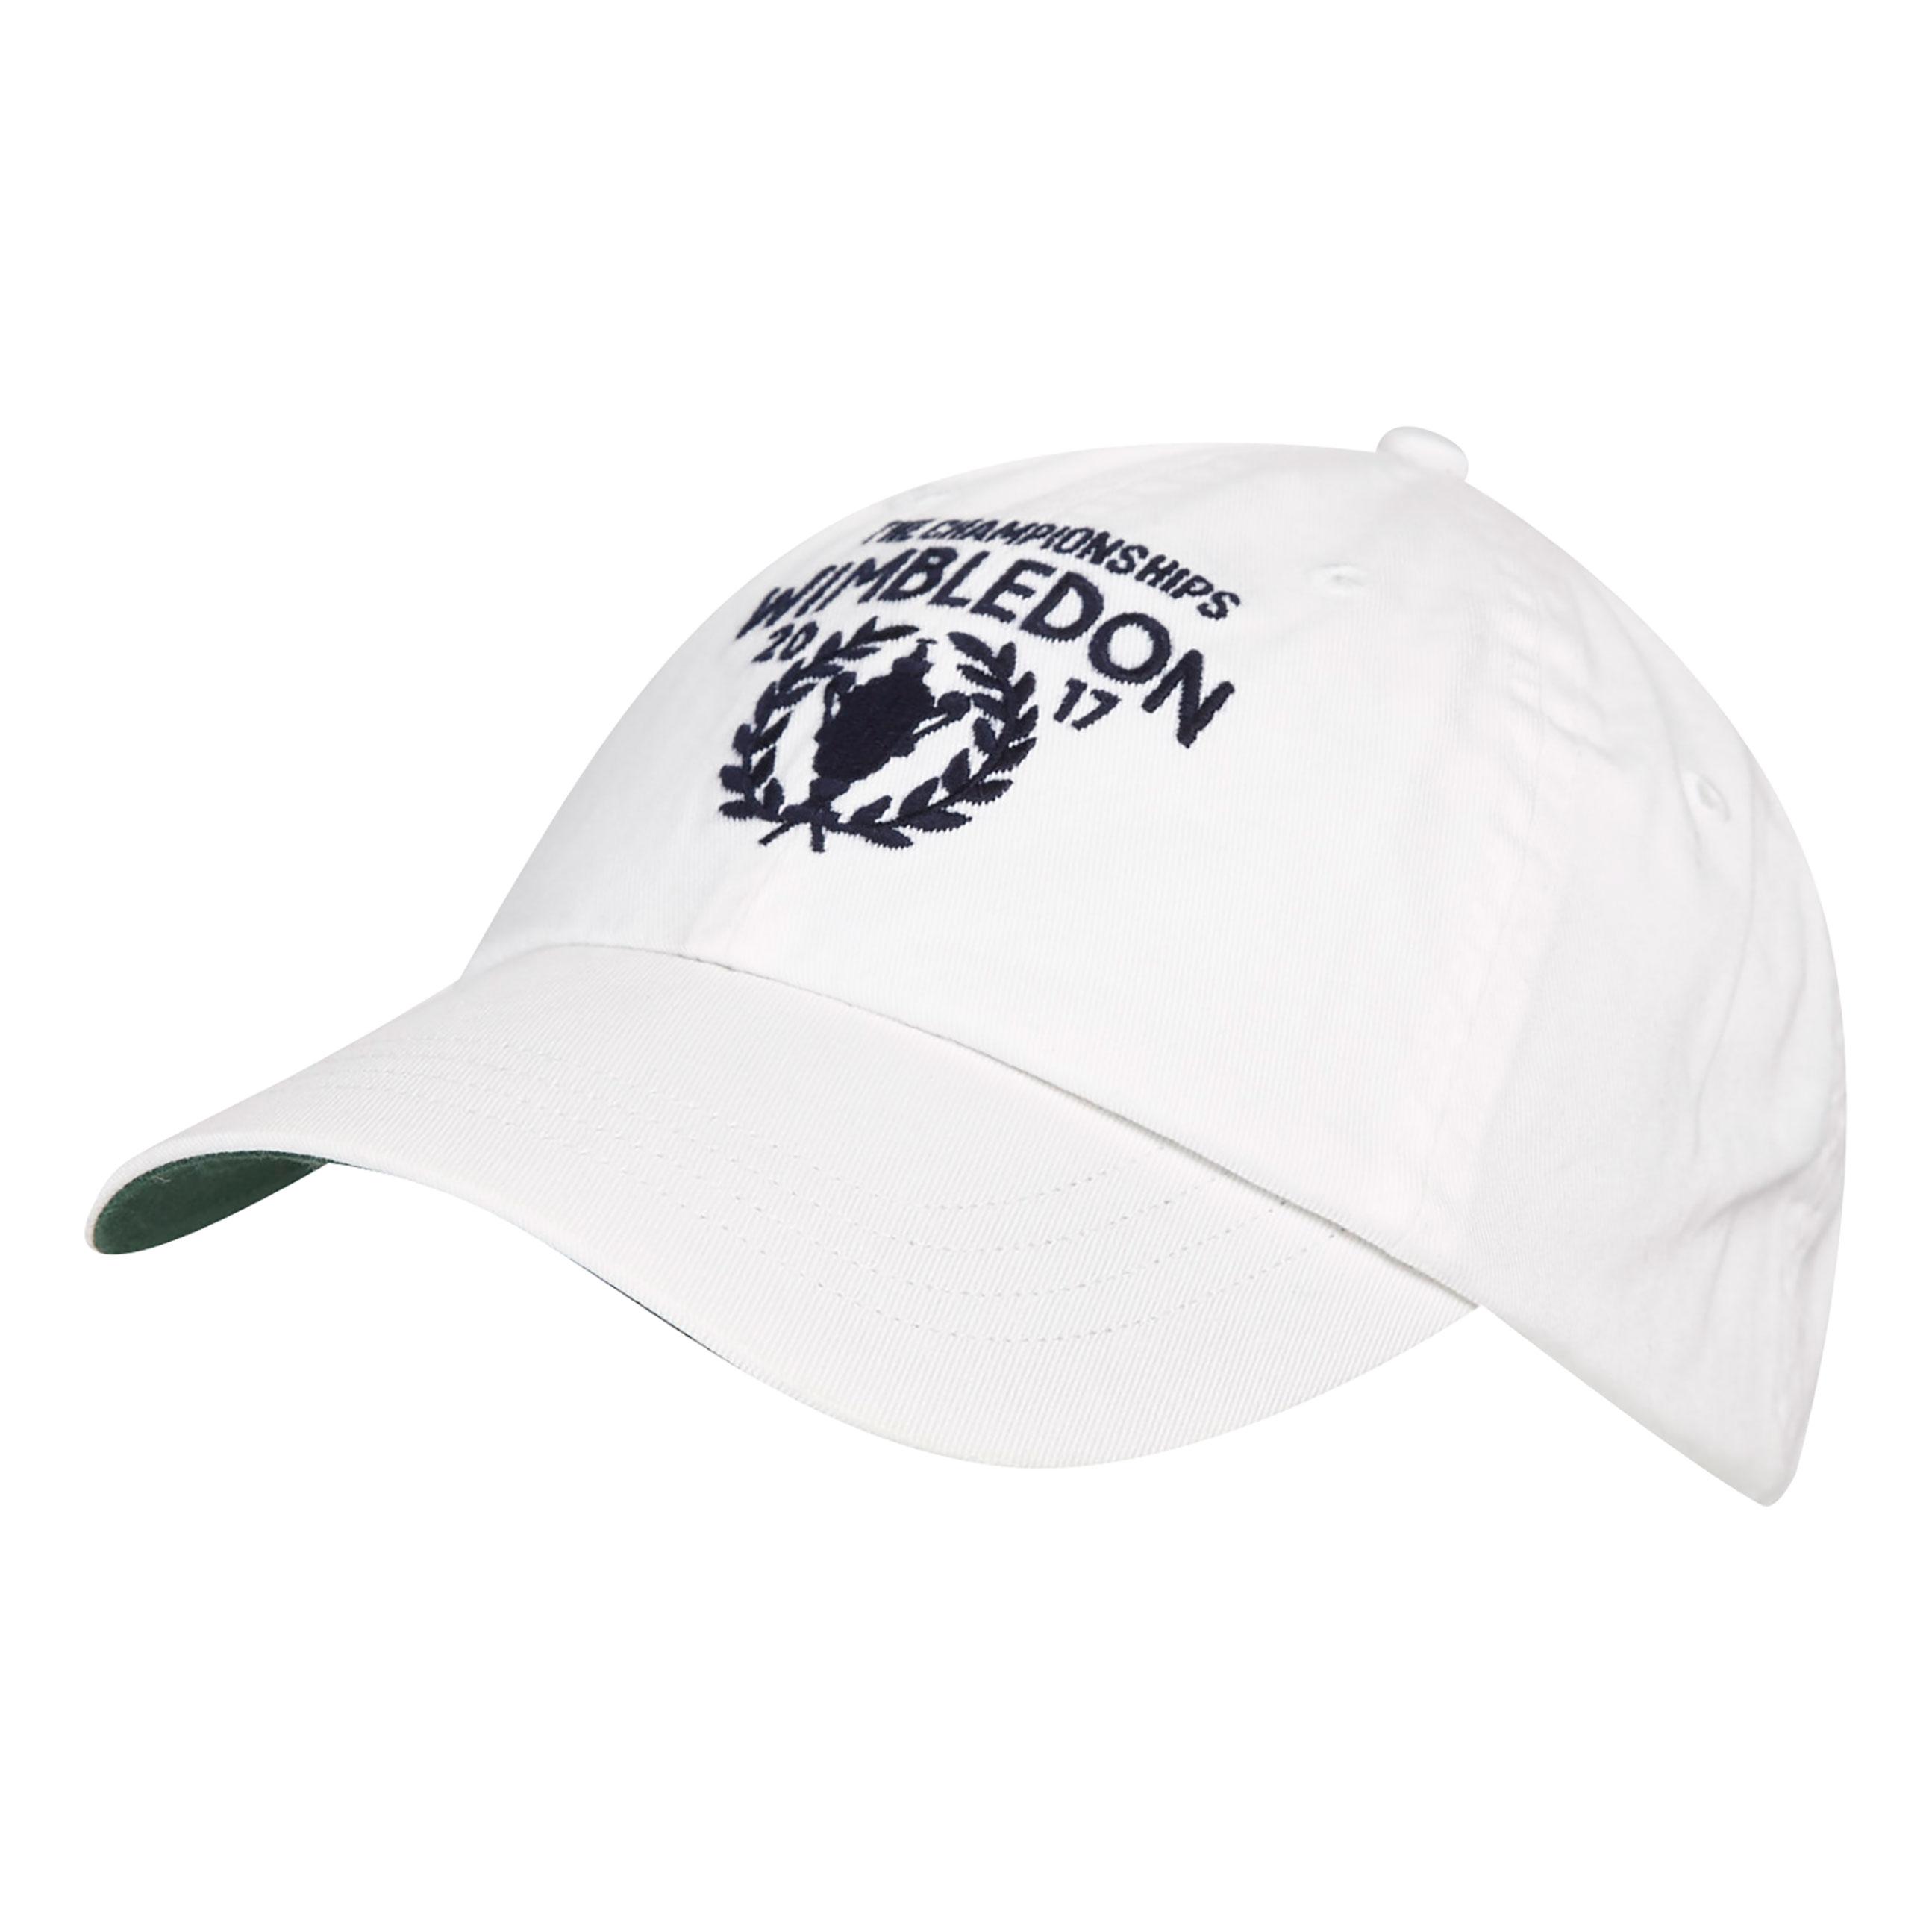 Wimbledon Ralph Lauren Classic Sports Cap - White